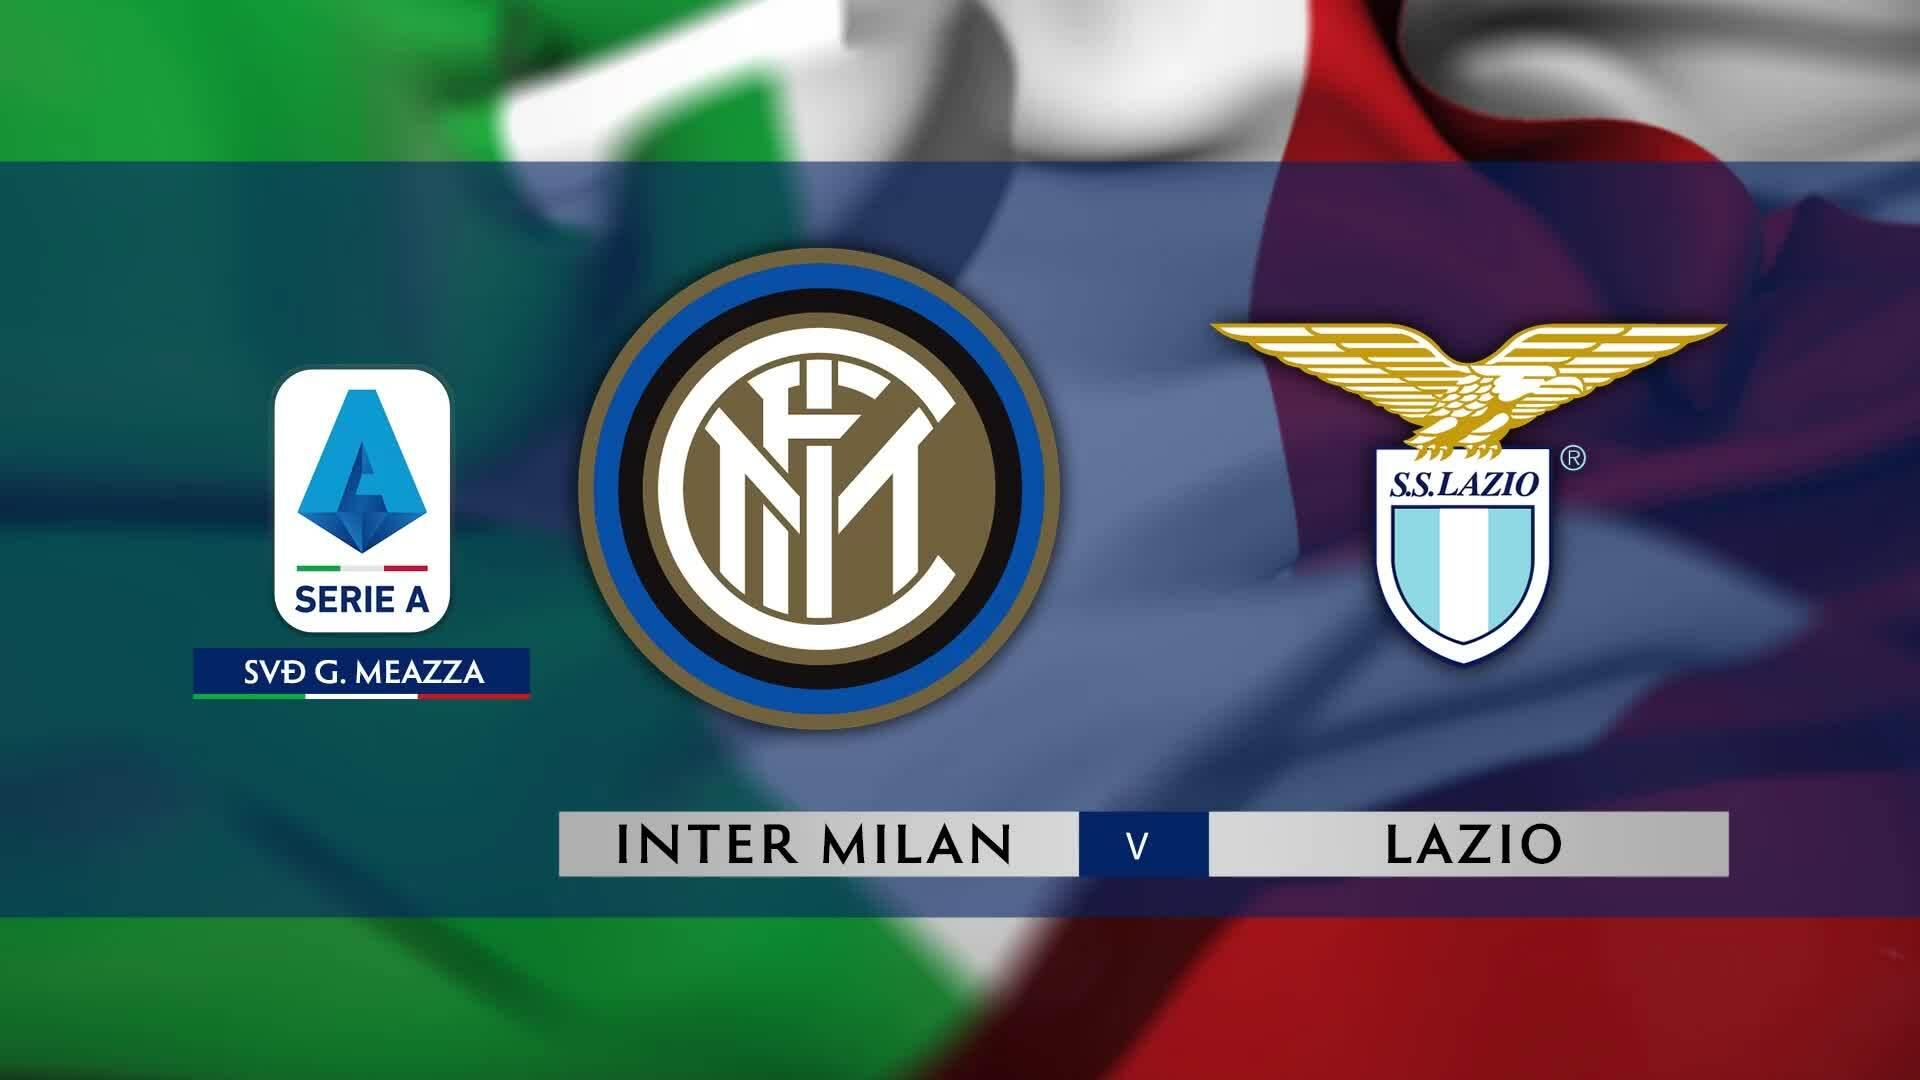 Inter Milan 1-0 Lazio